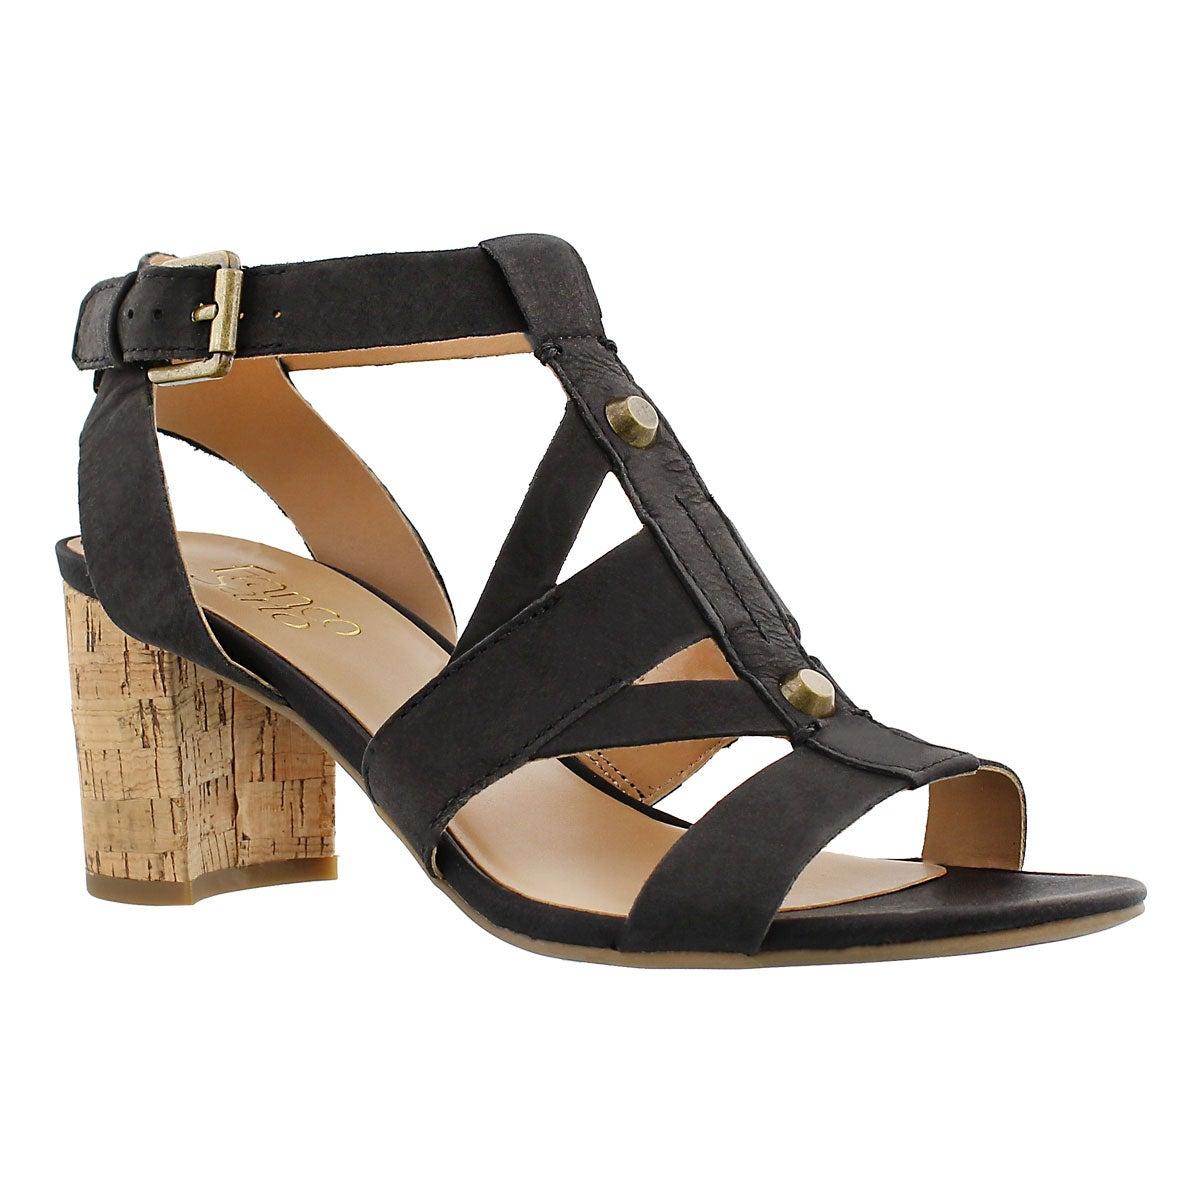 Lds Paloma black dress sandal